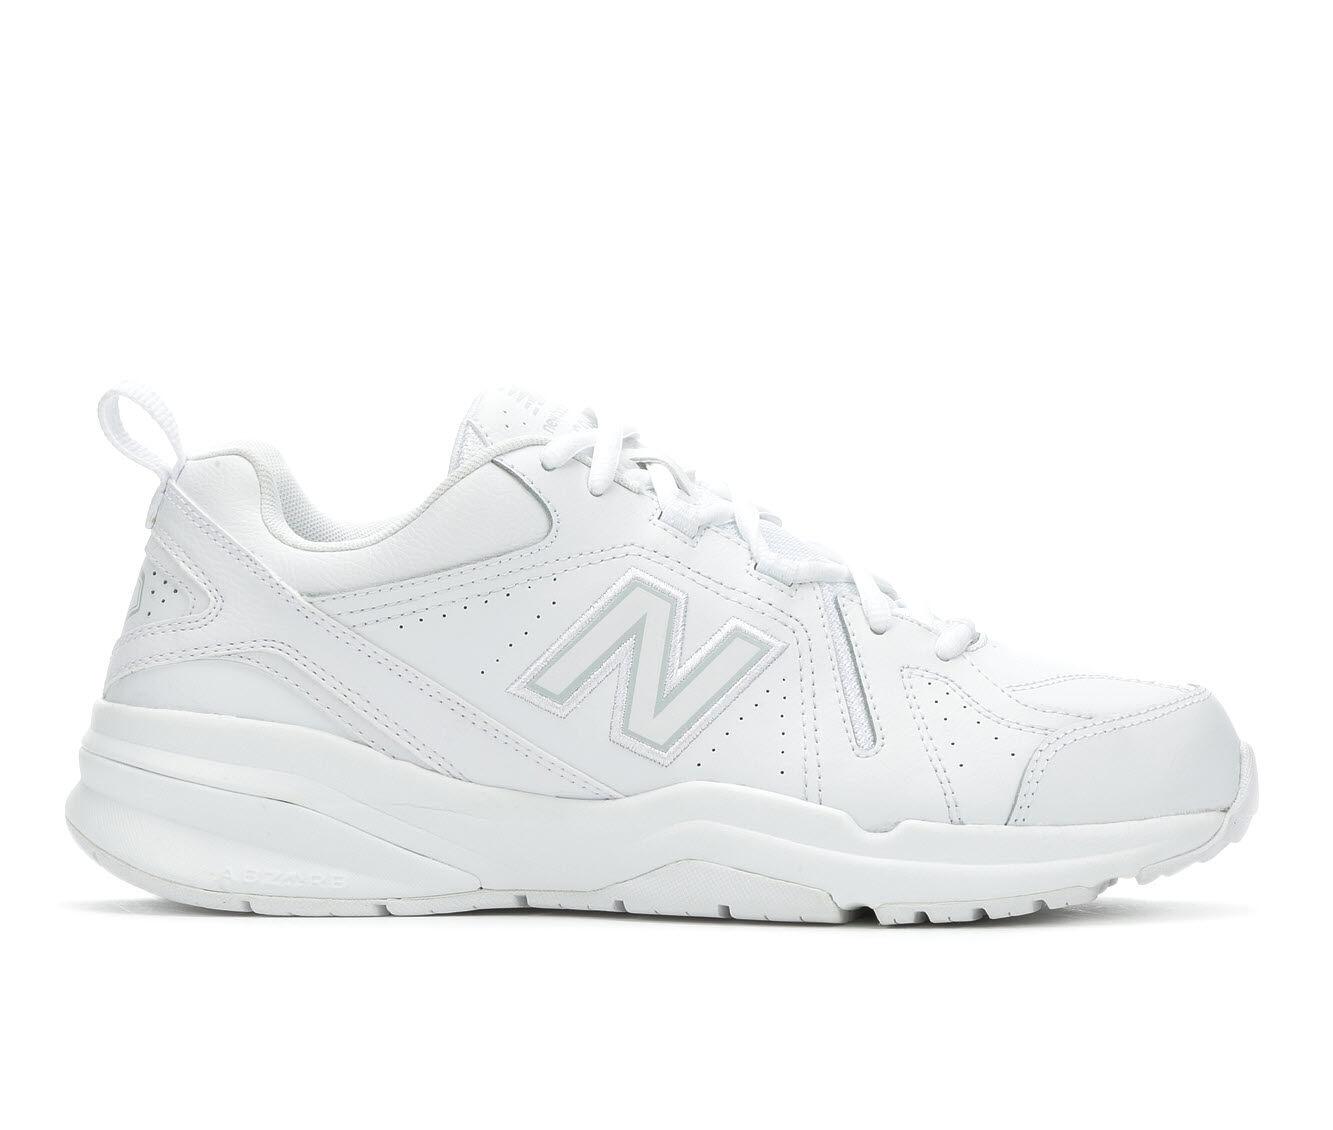 Innovative Men's New Balance MX608V5 Training Shoes Wht/Wht